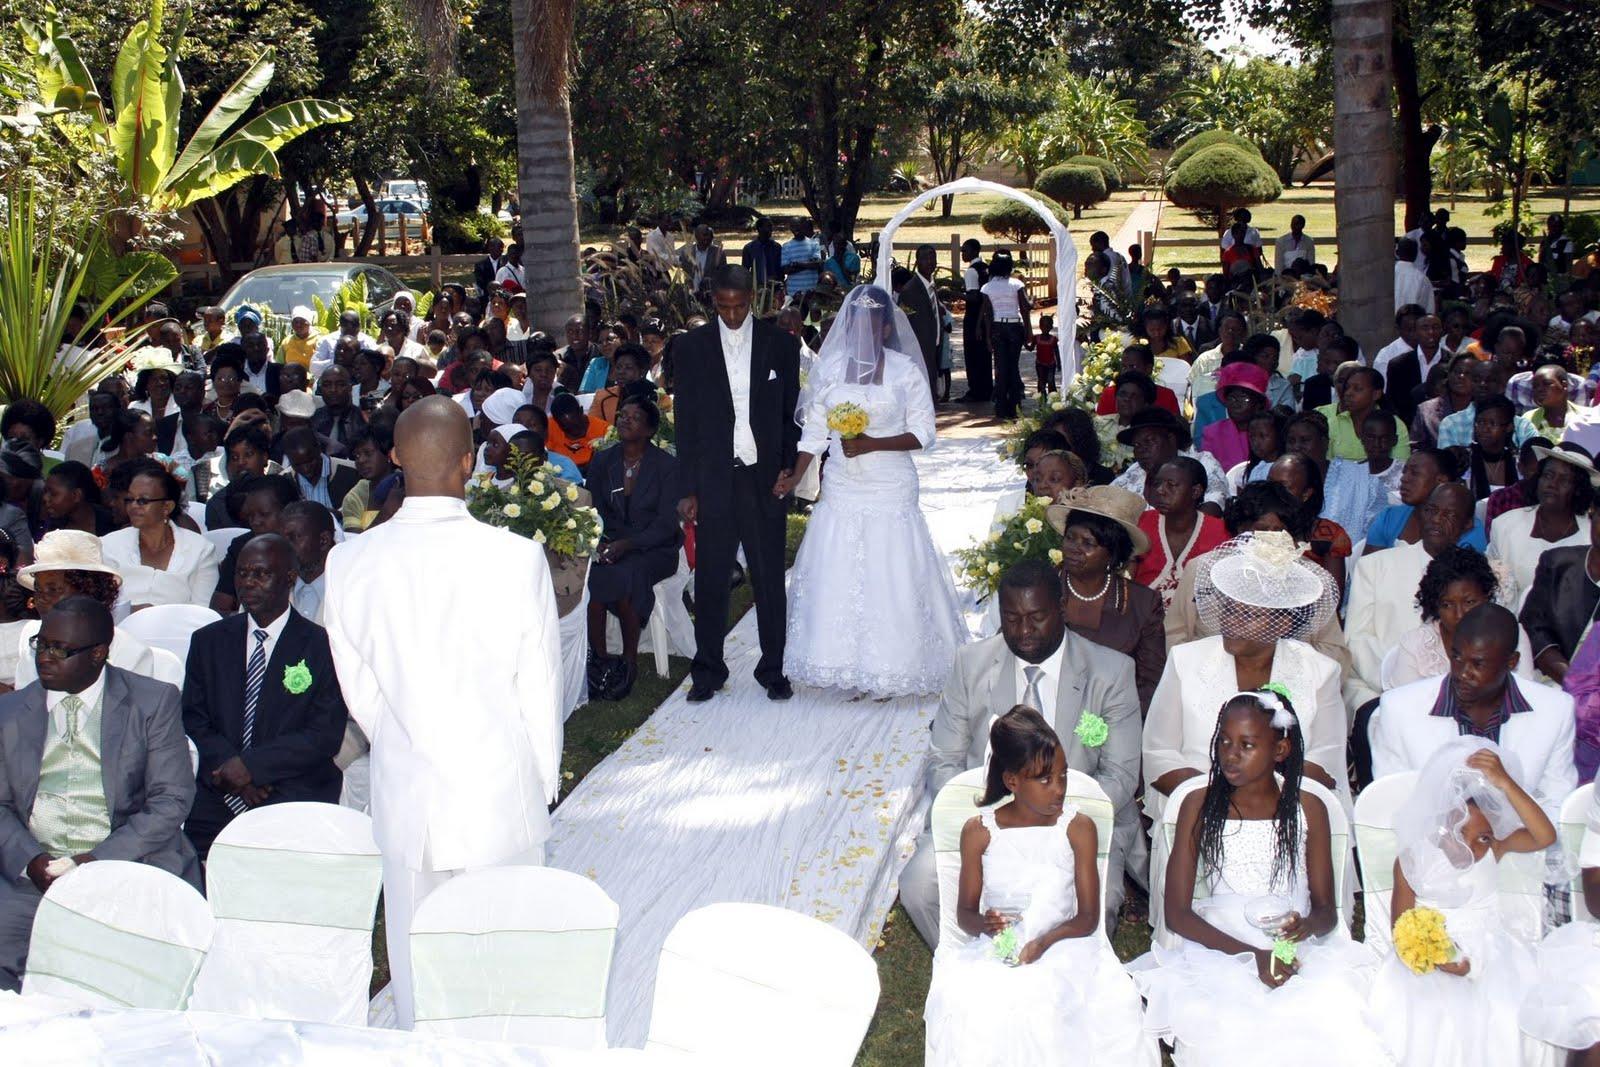 garden wedding venues zimbabwe foto bugil bokep 2017